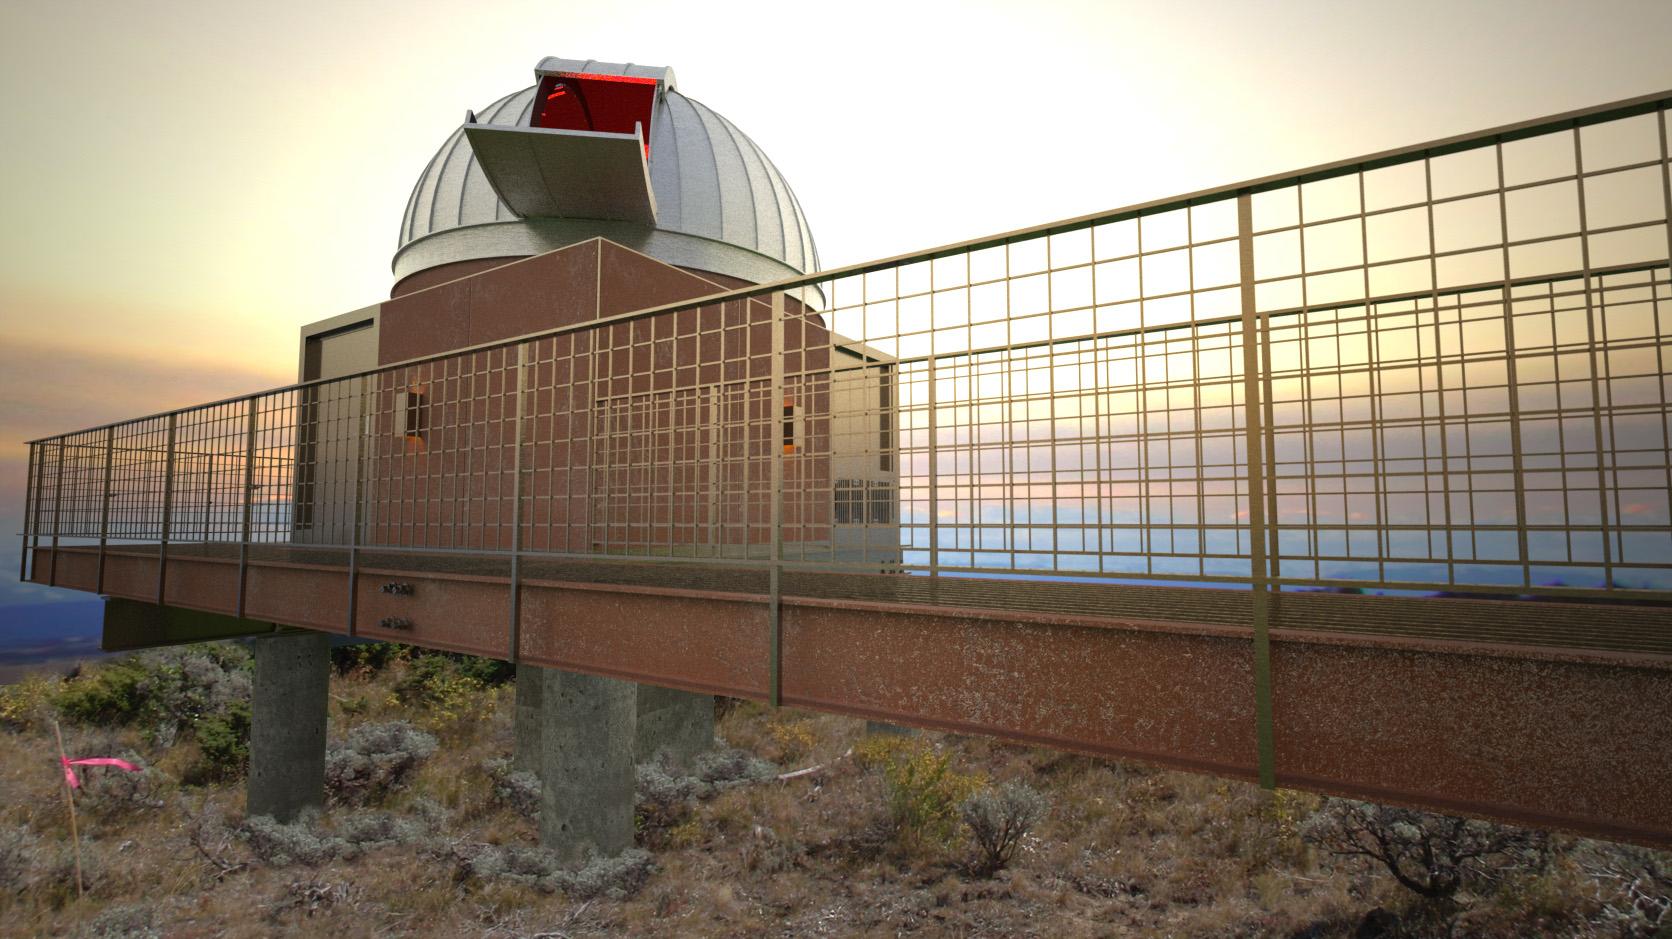 Passive Solar Atchitecture Observatory - 12.jpg